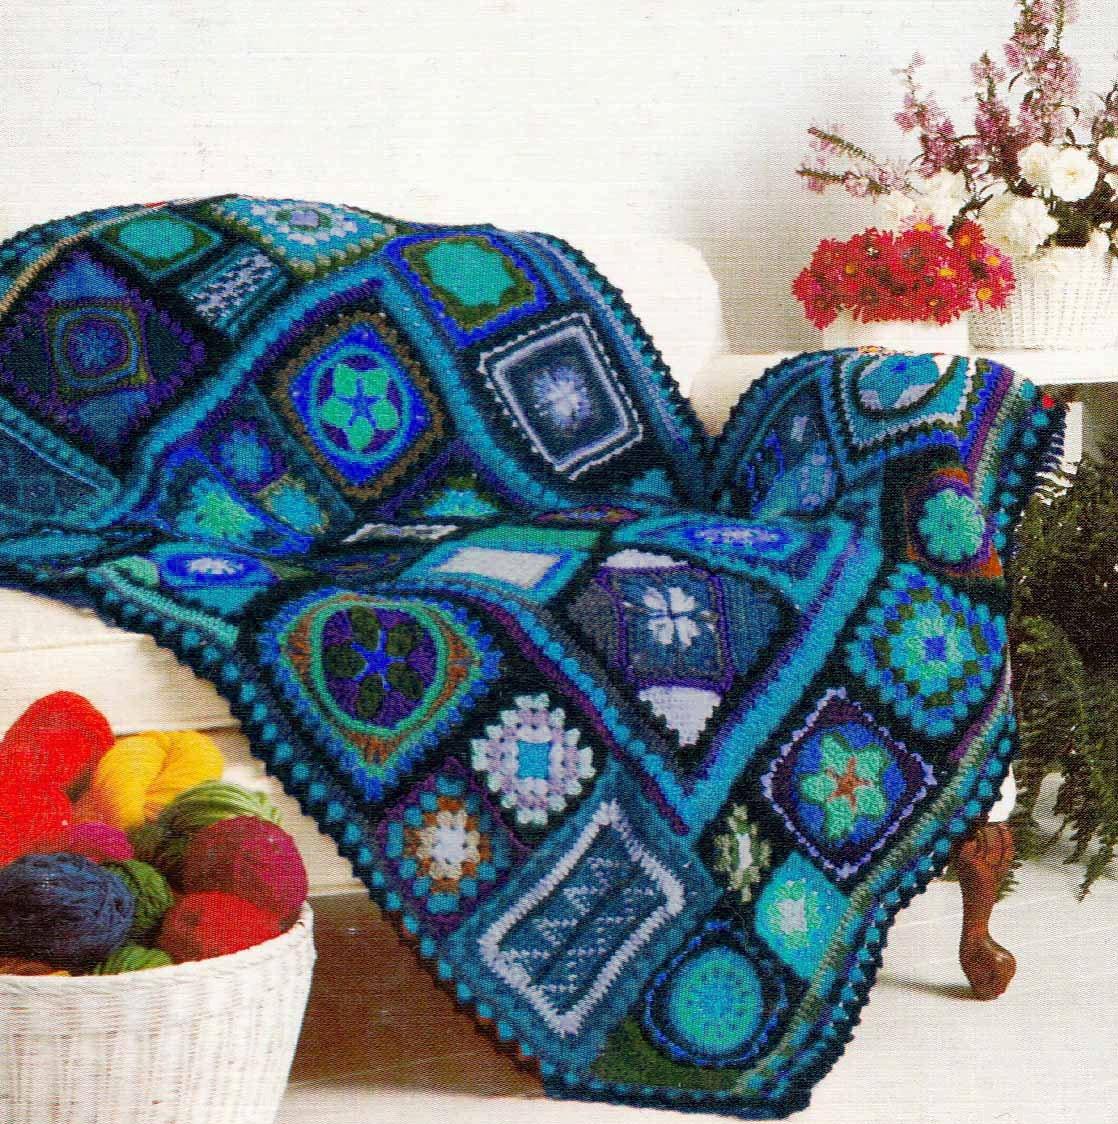 Rainbow Granny Square Blanket Pattern Granny Square Blanket